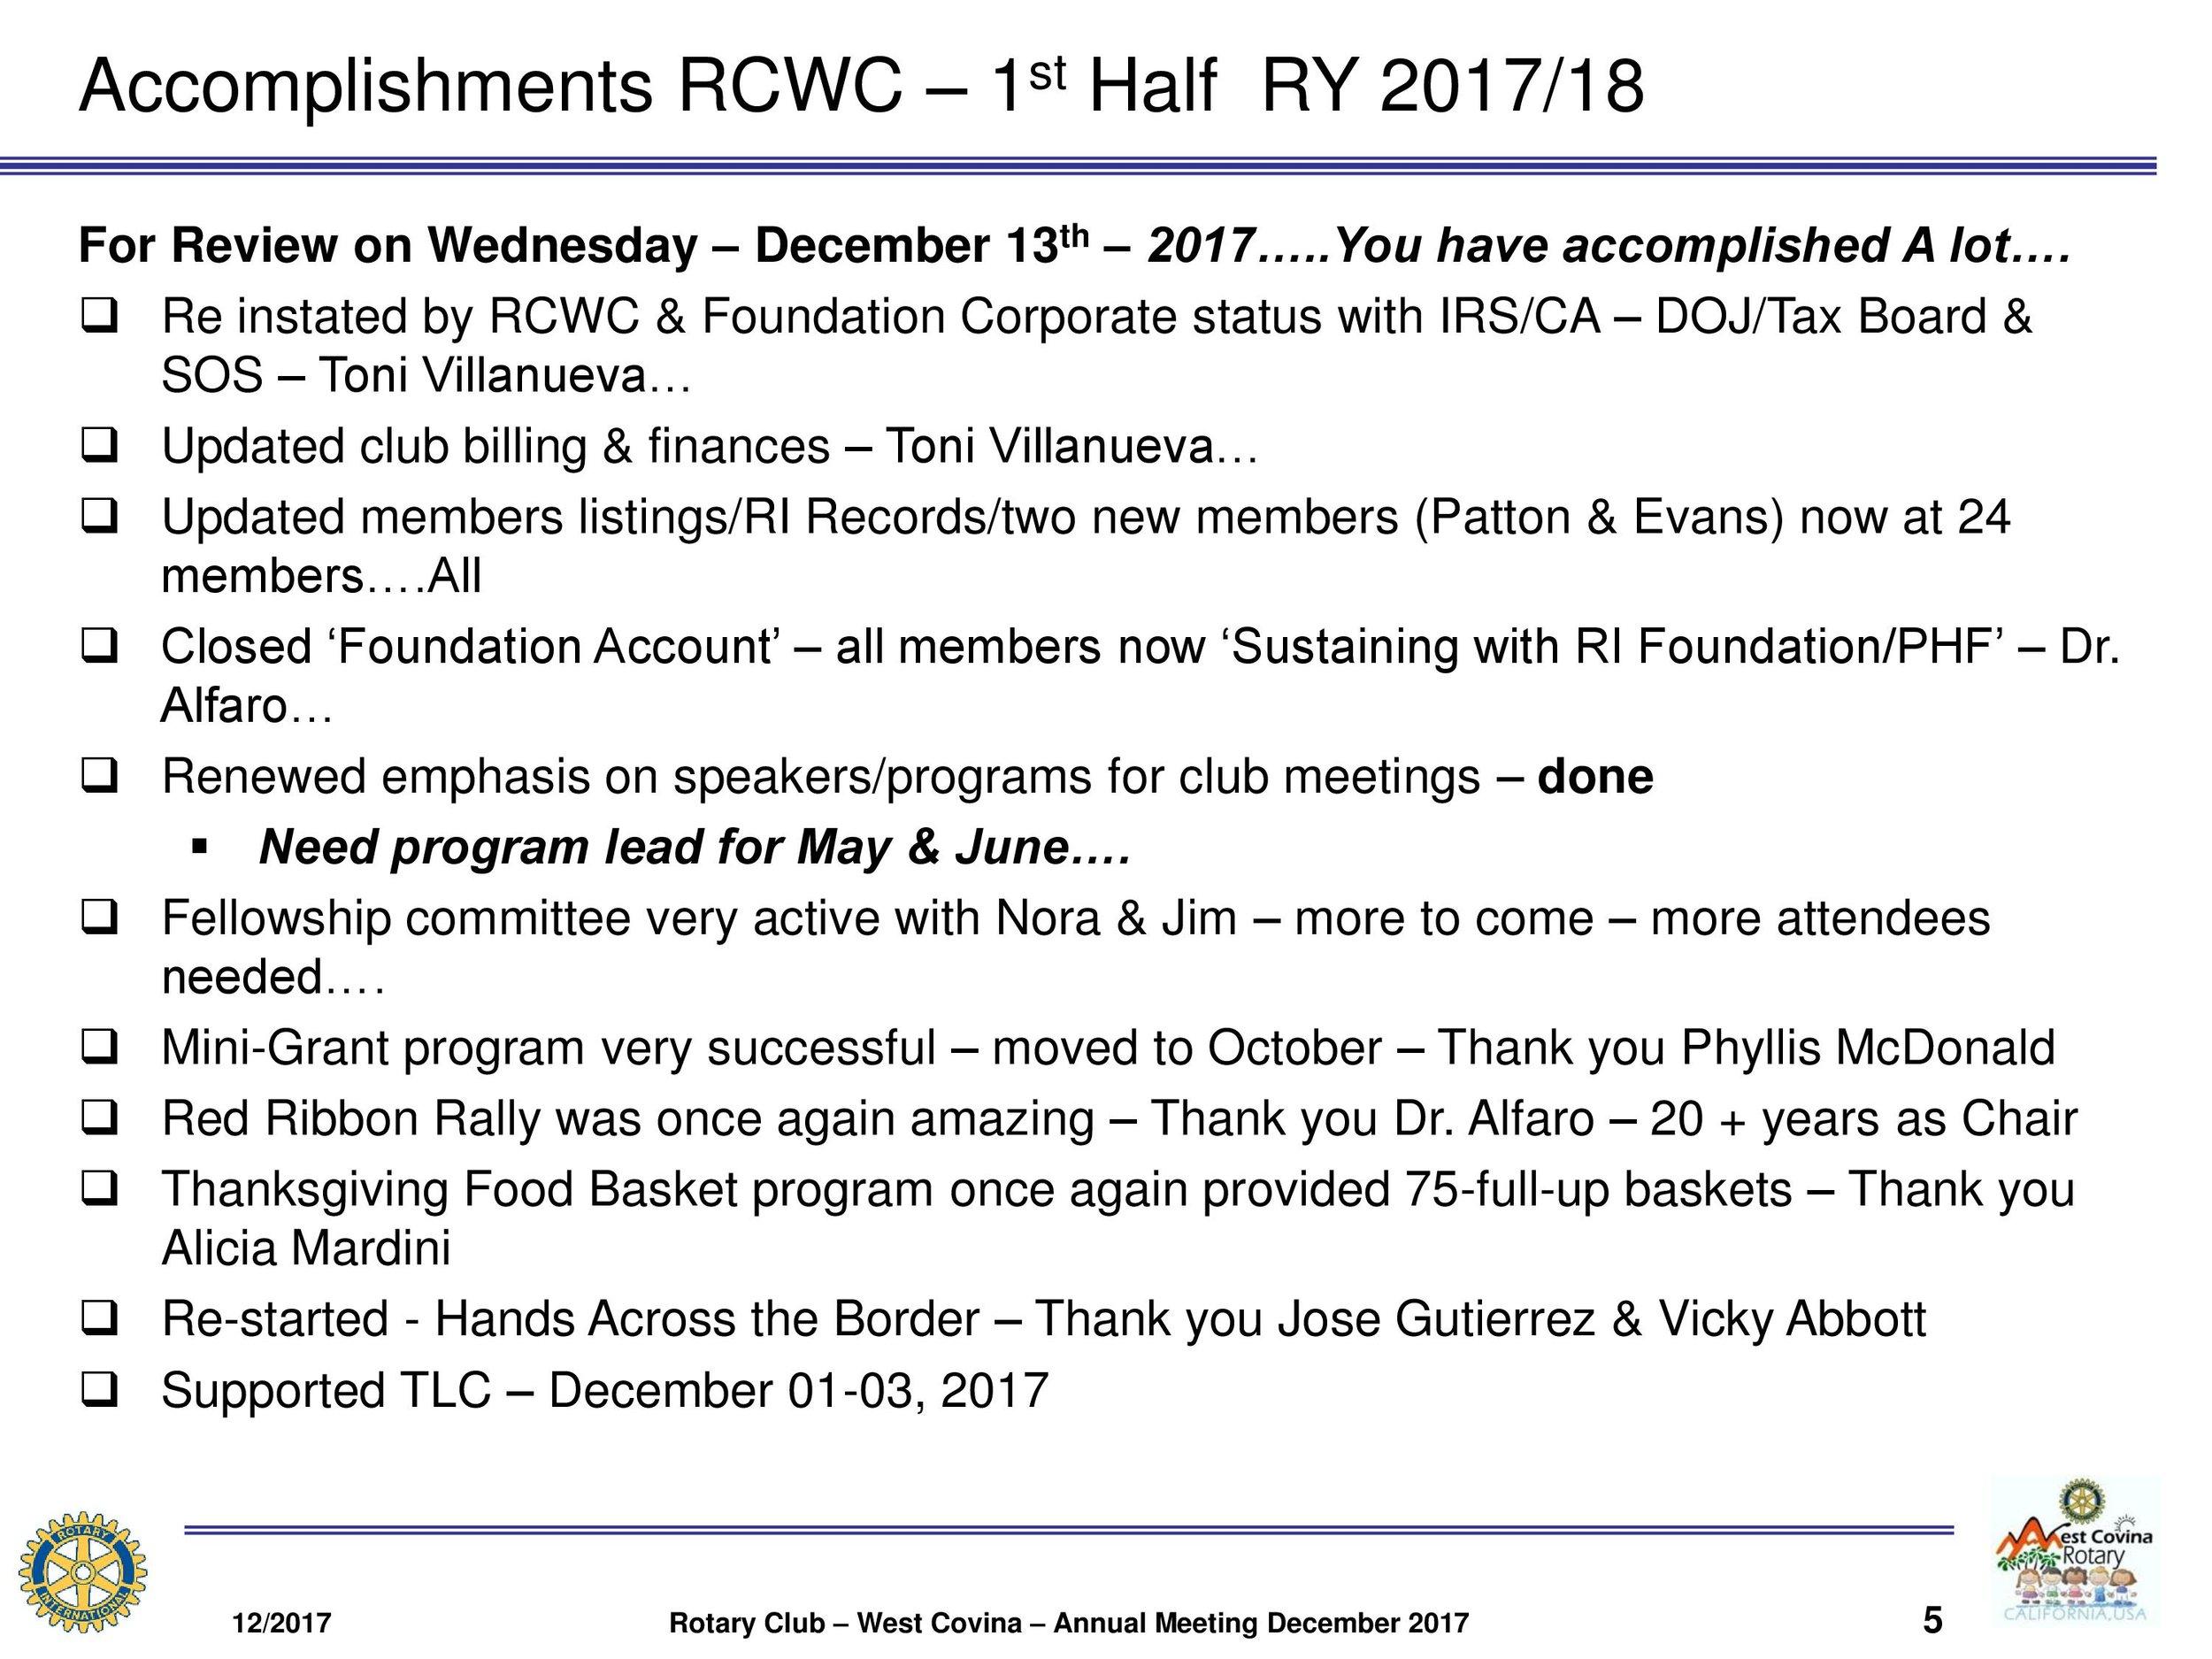 RCWC.AnnualMtg.12.13..2017_5.jpg